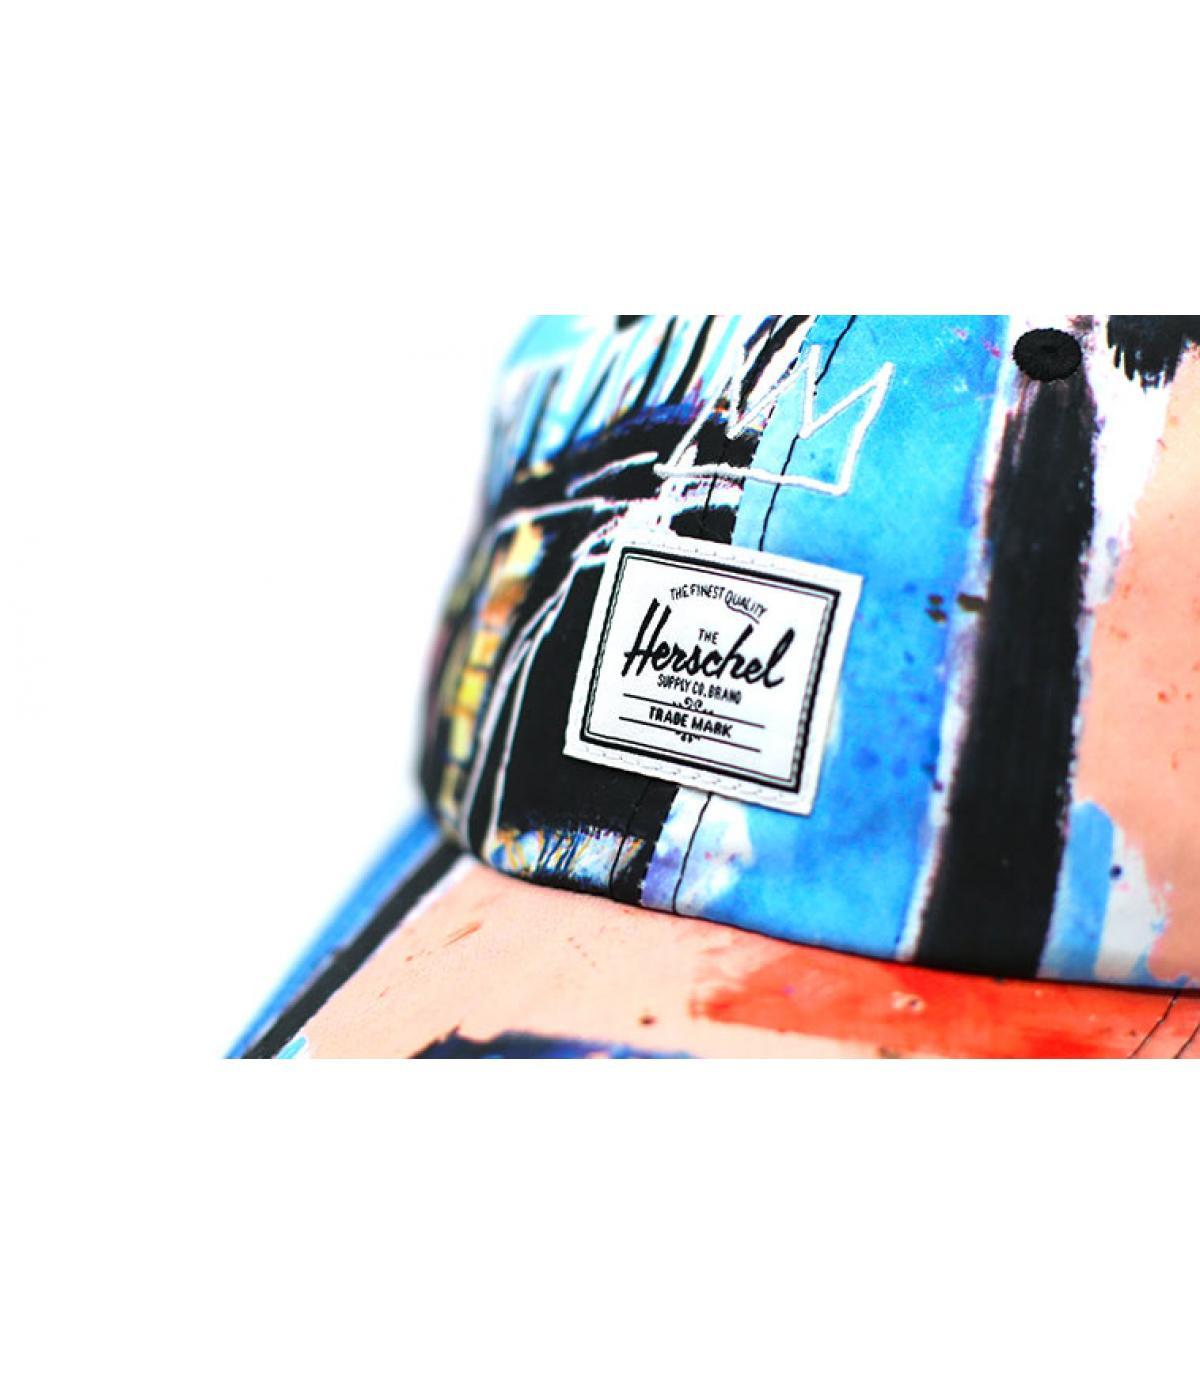 Dettagli Curve Basquiat Mosby Voyage - image 3